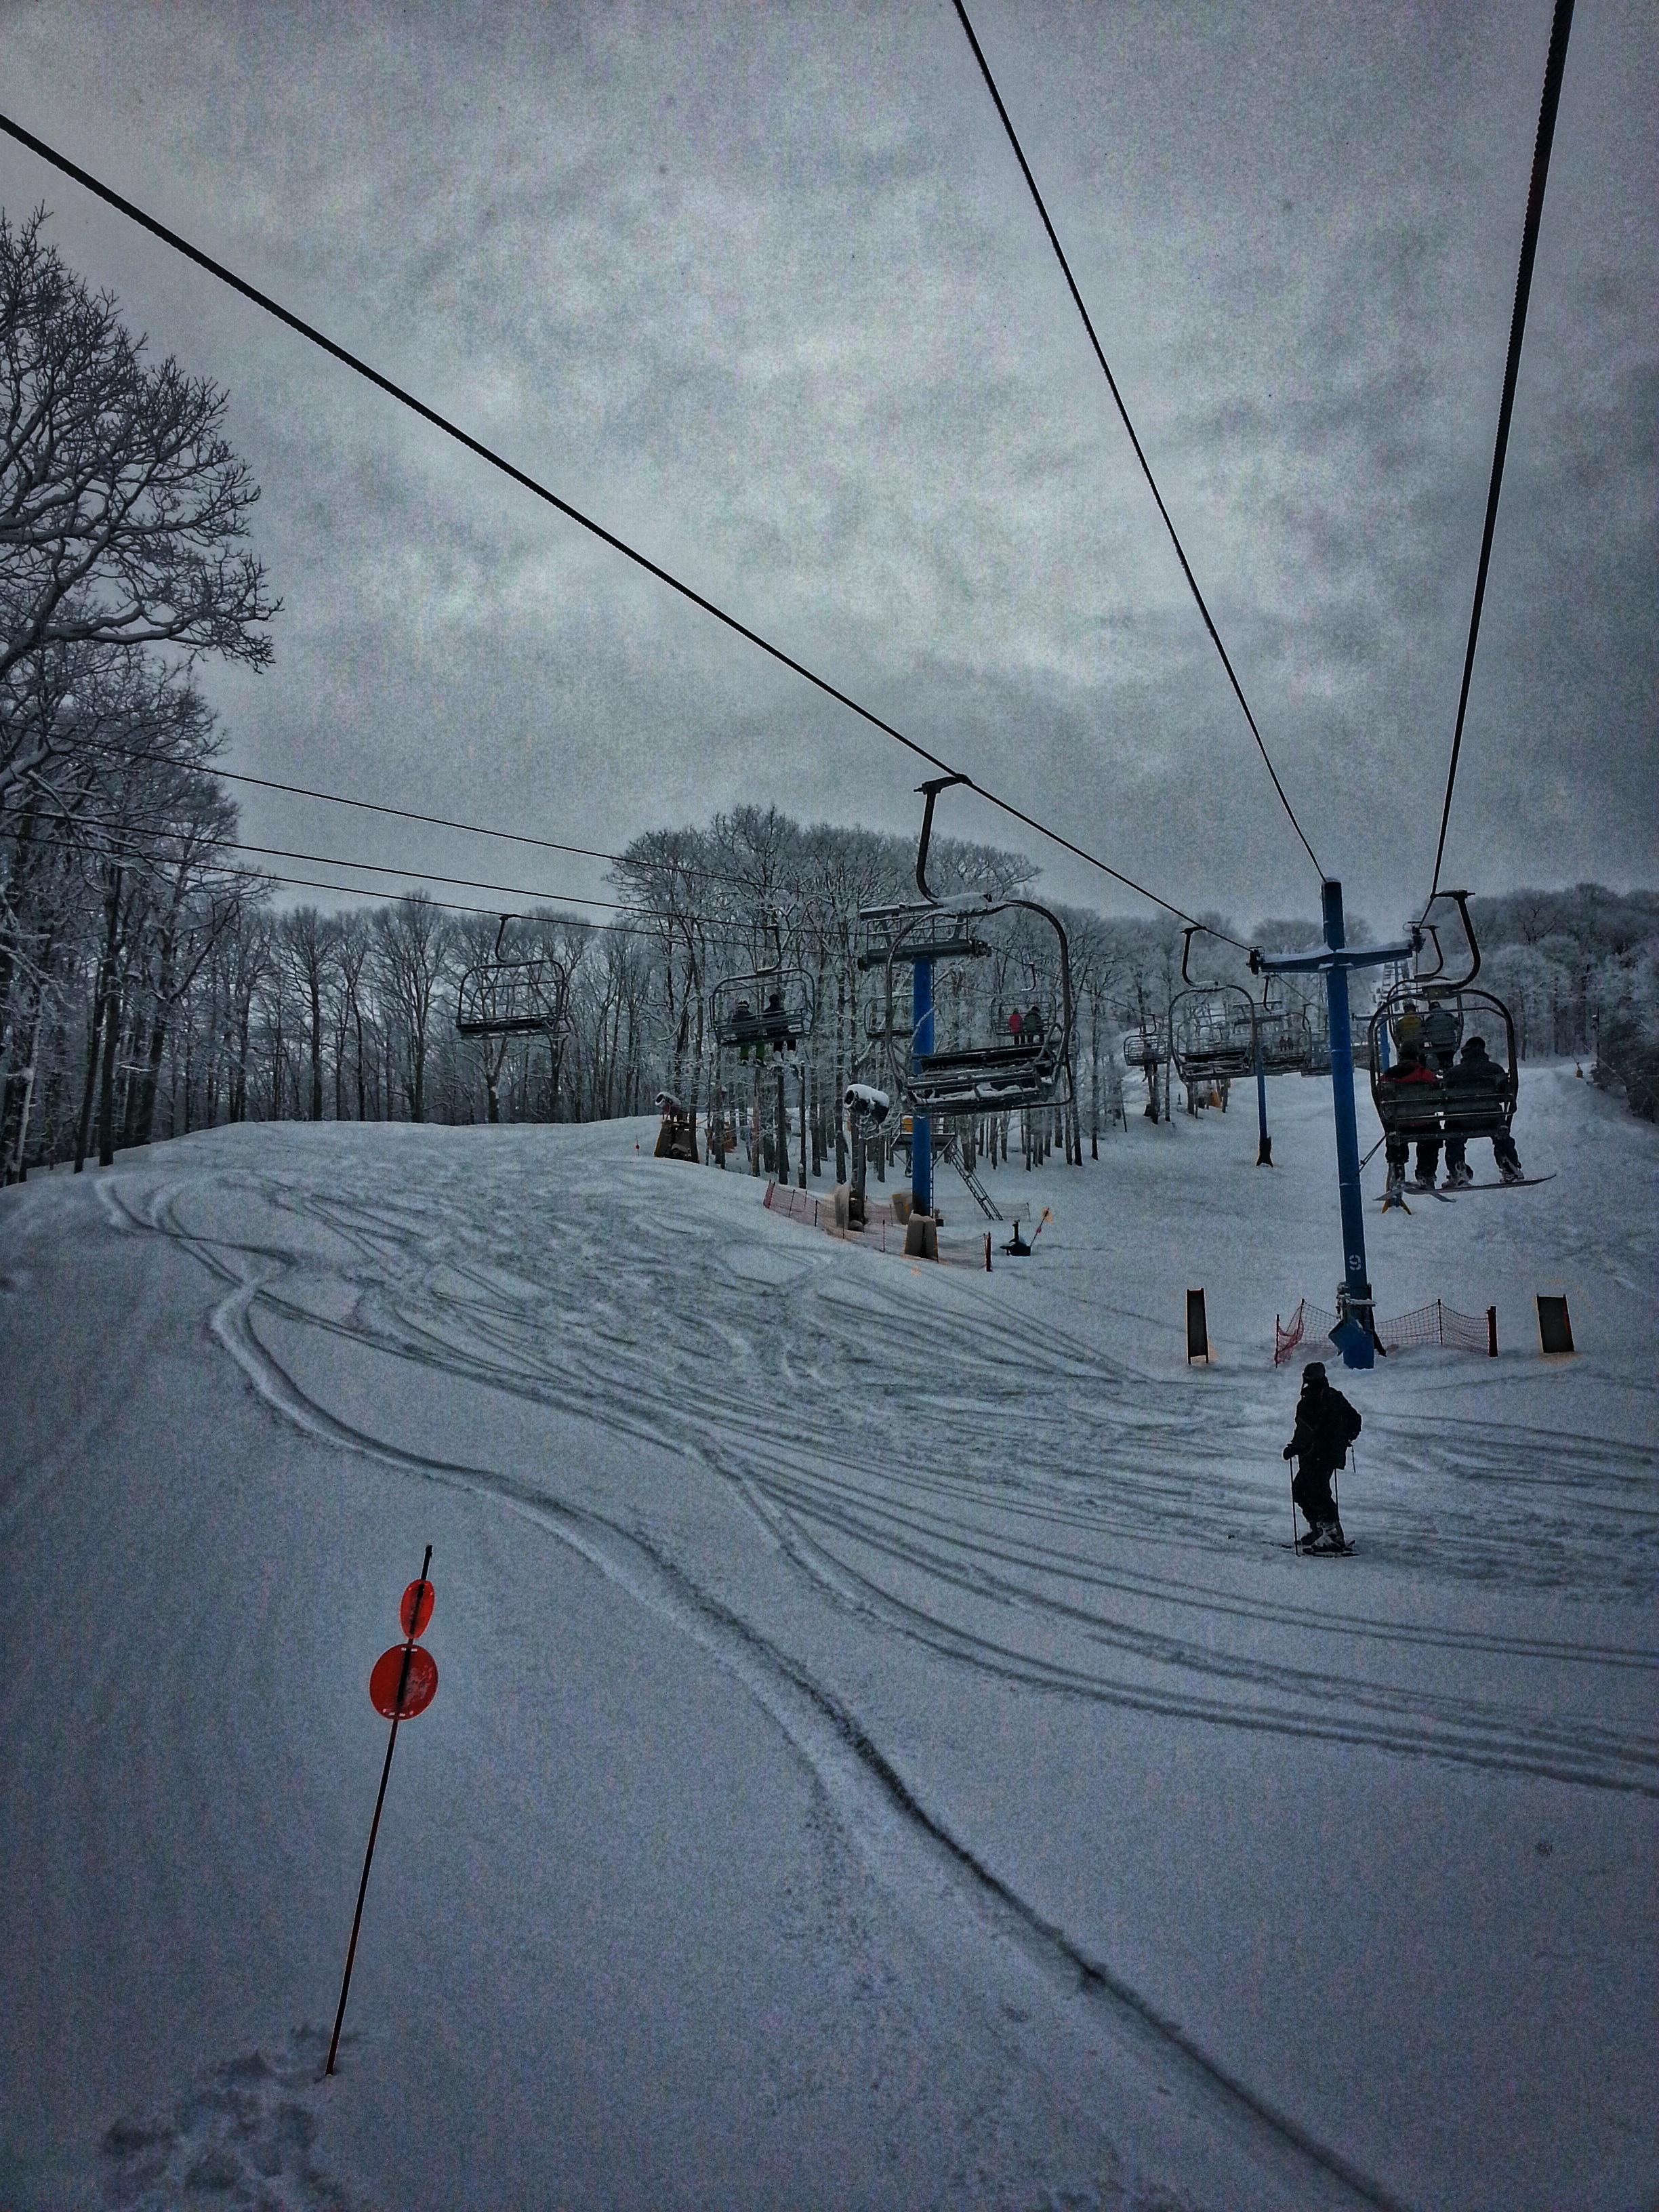 2:13:14 snowboarding edit.jpeg